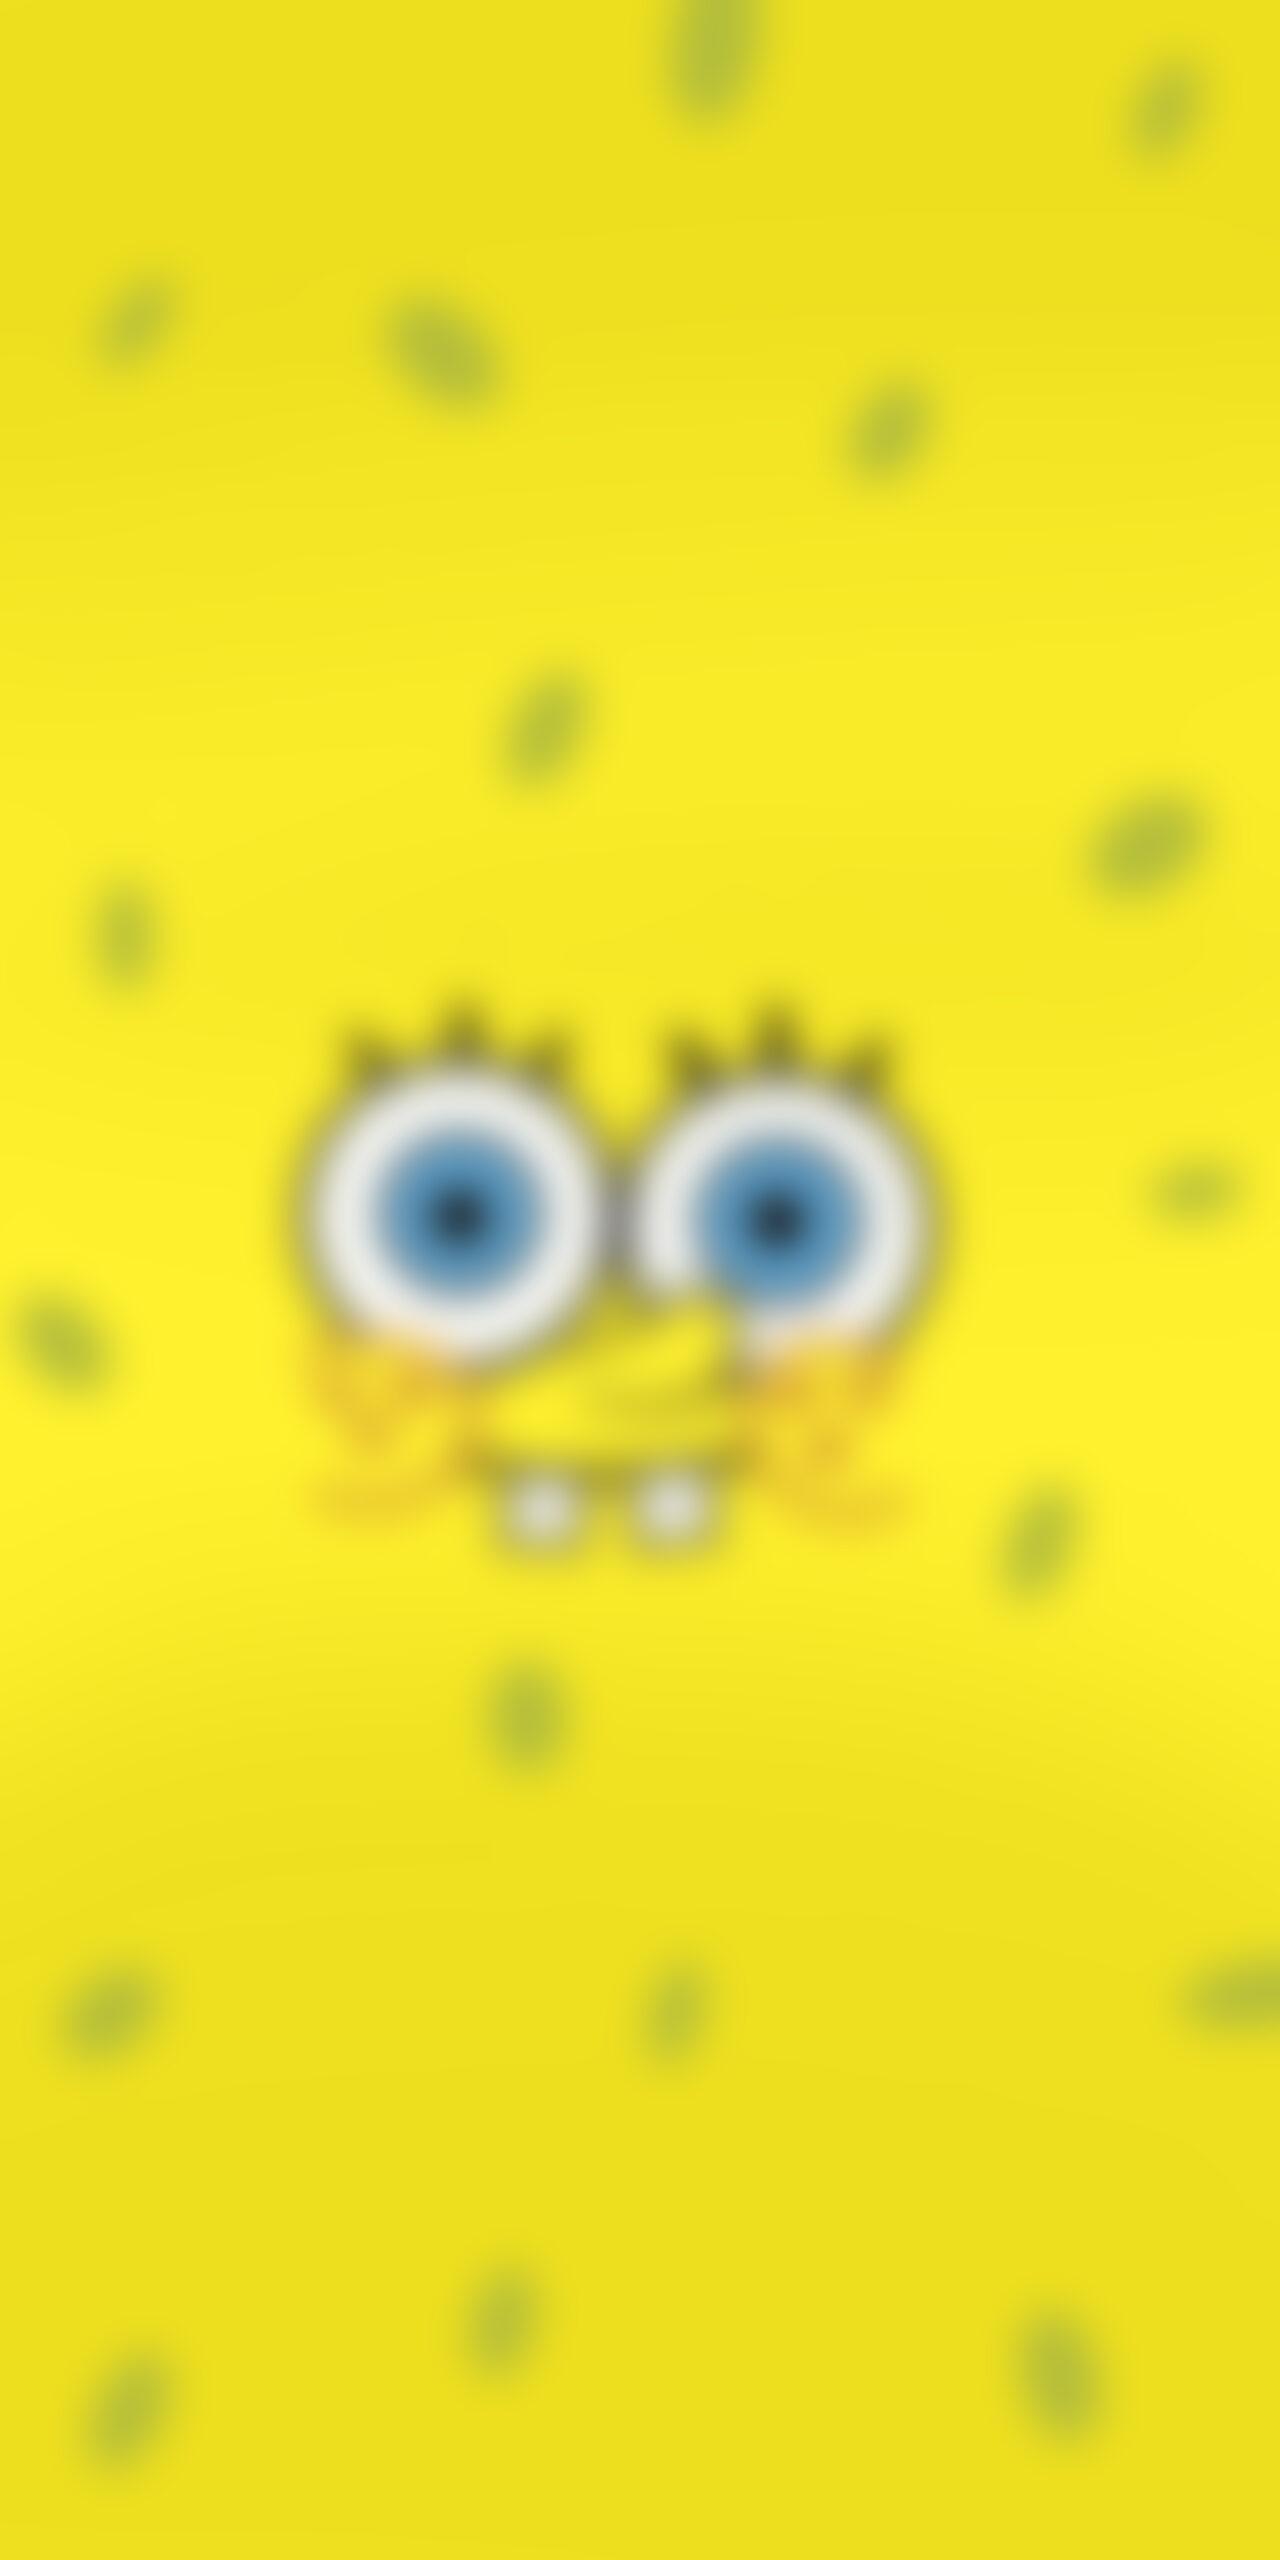 spongebob smiling face blur wallpaper